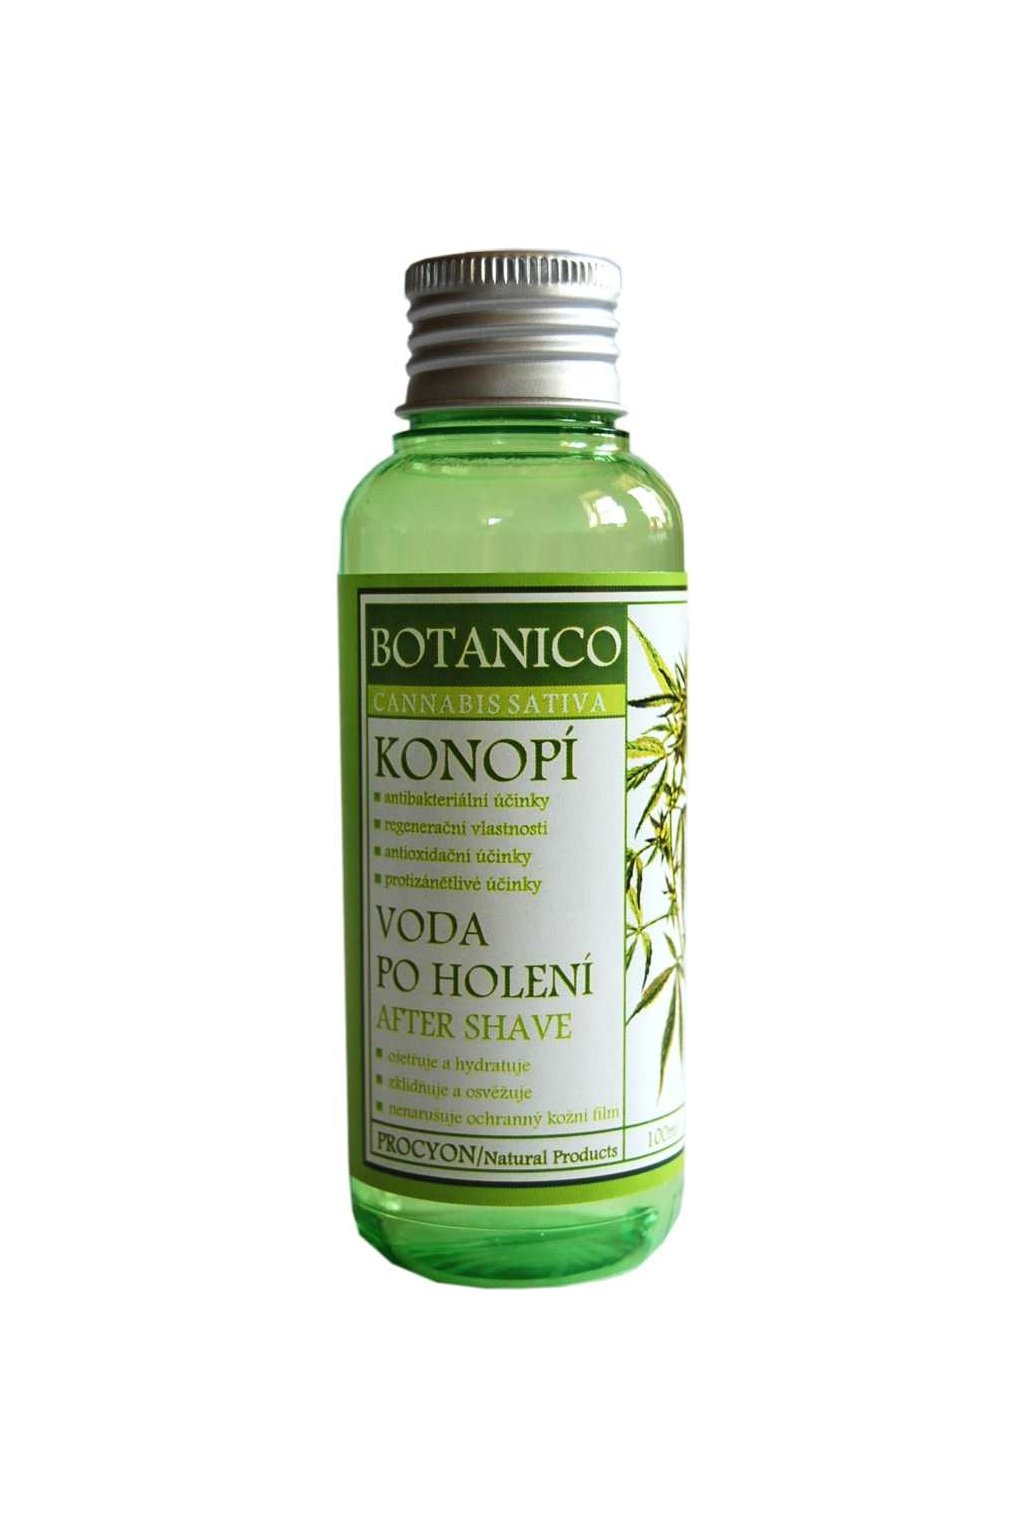 Botanico - Konopná voda po holení - 100ml